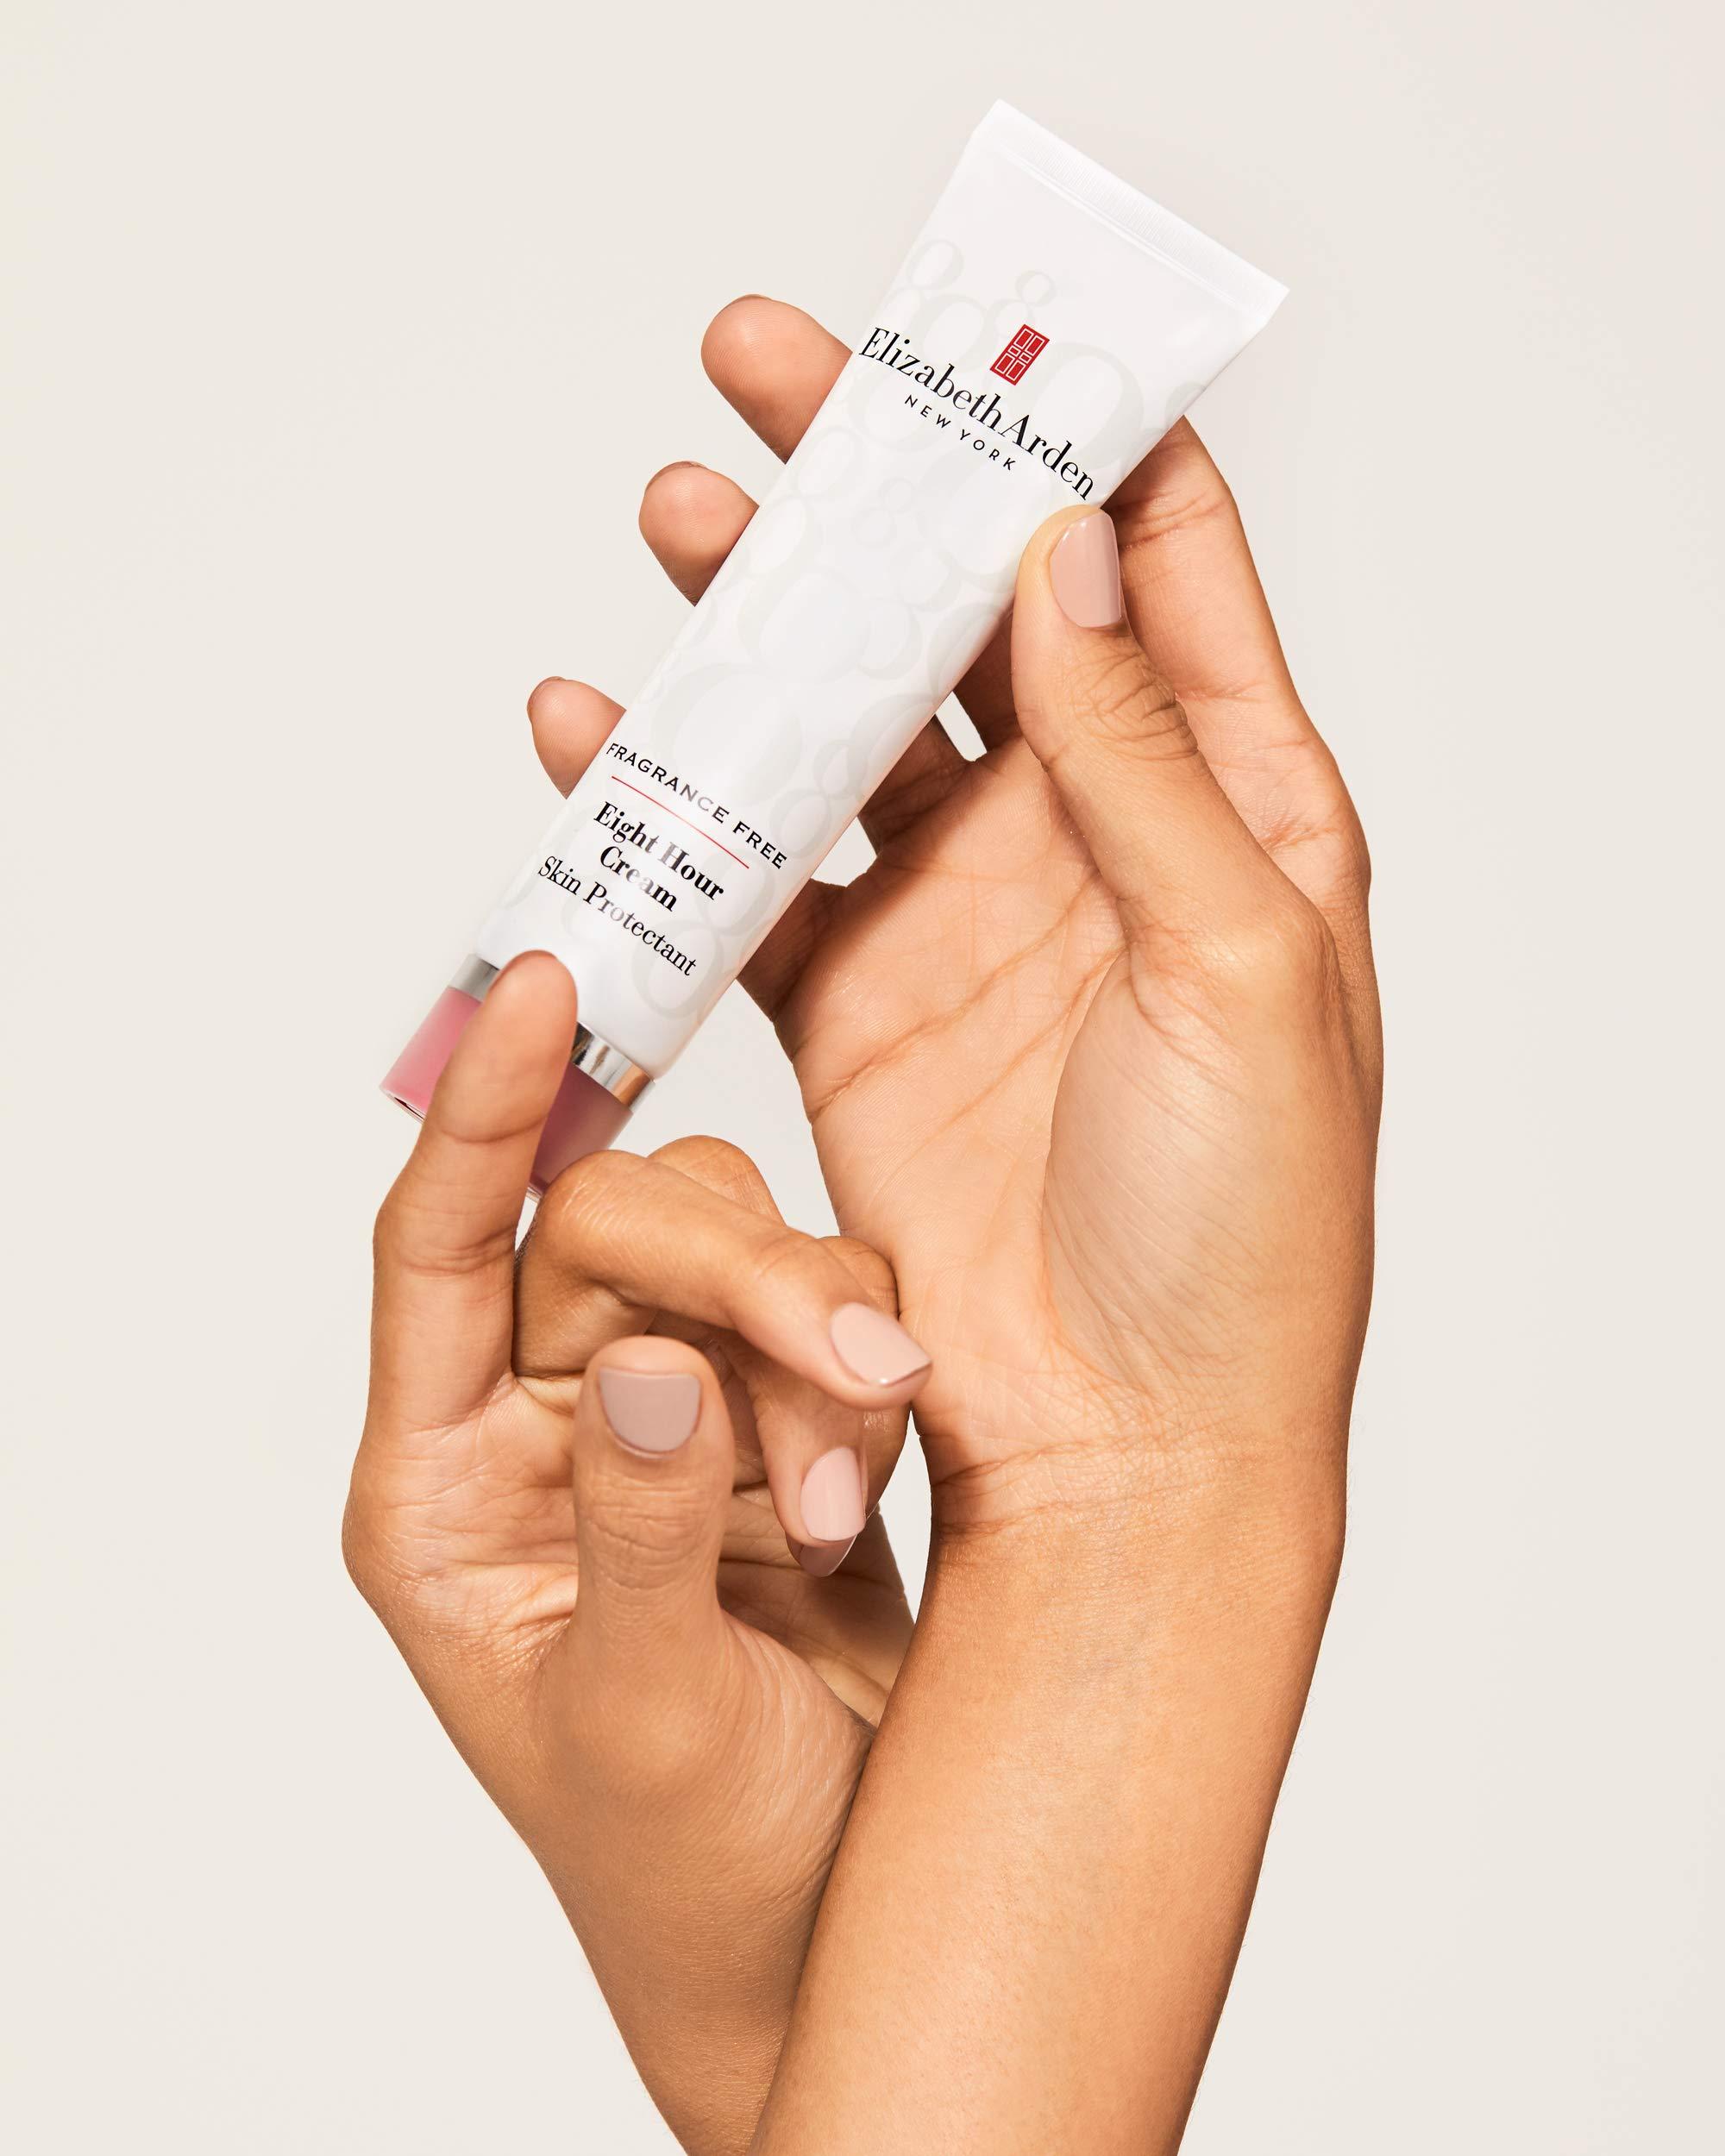 Elizabeth Arden Eight Hour Skin Protectant Cream, Fragrance Free, 1.7 oz. by Elizabeth Arden (Image #5)